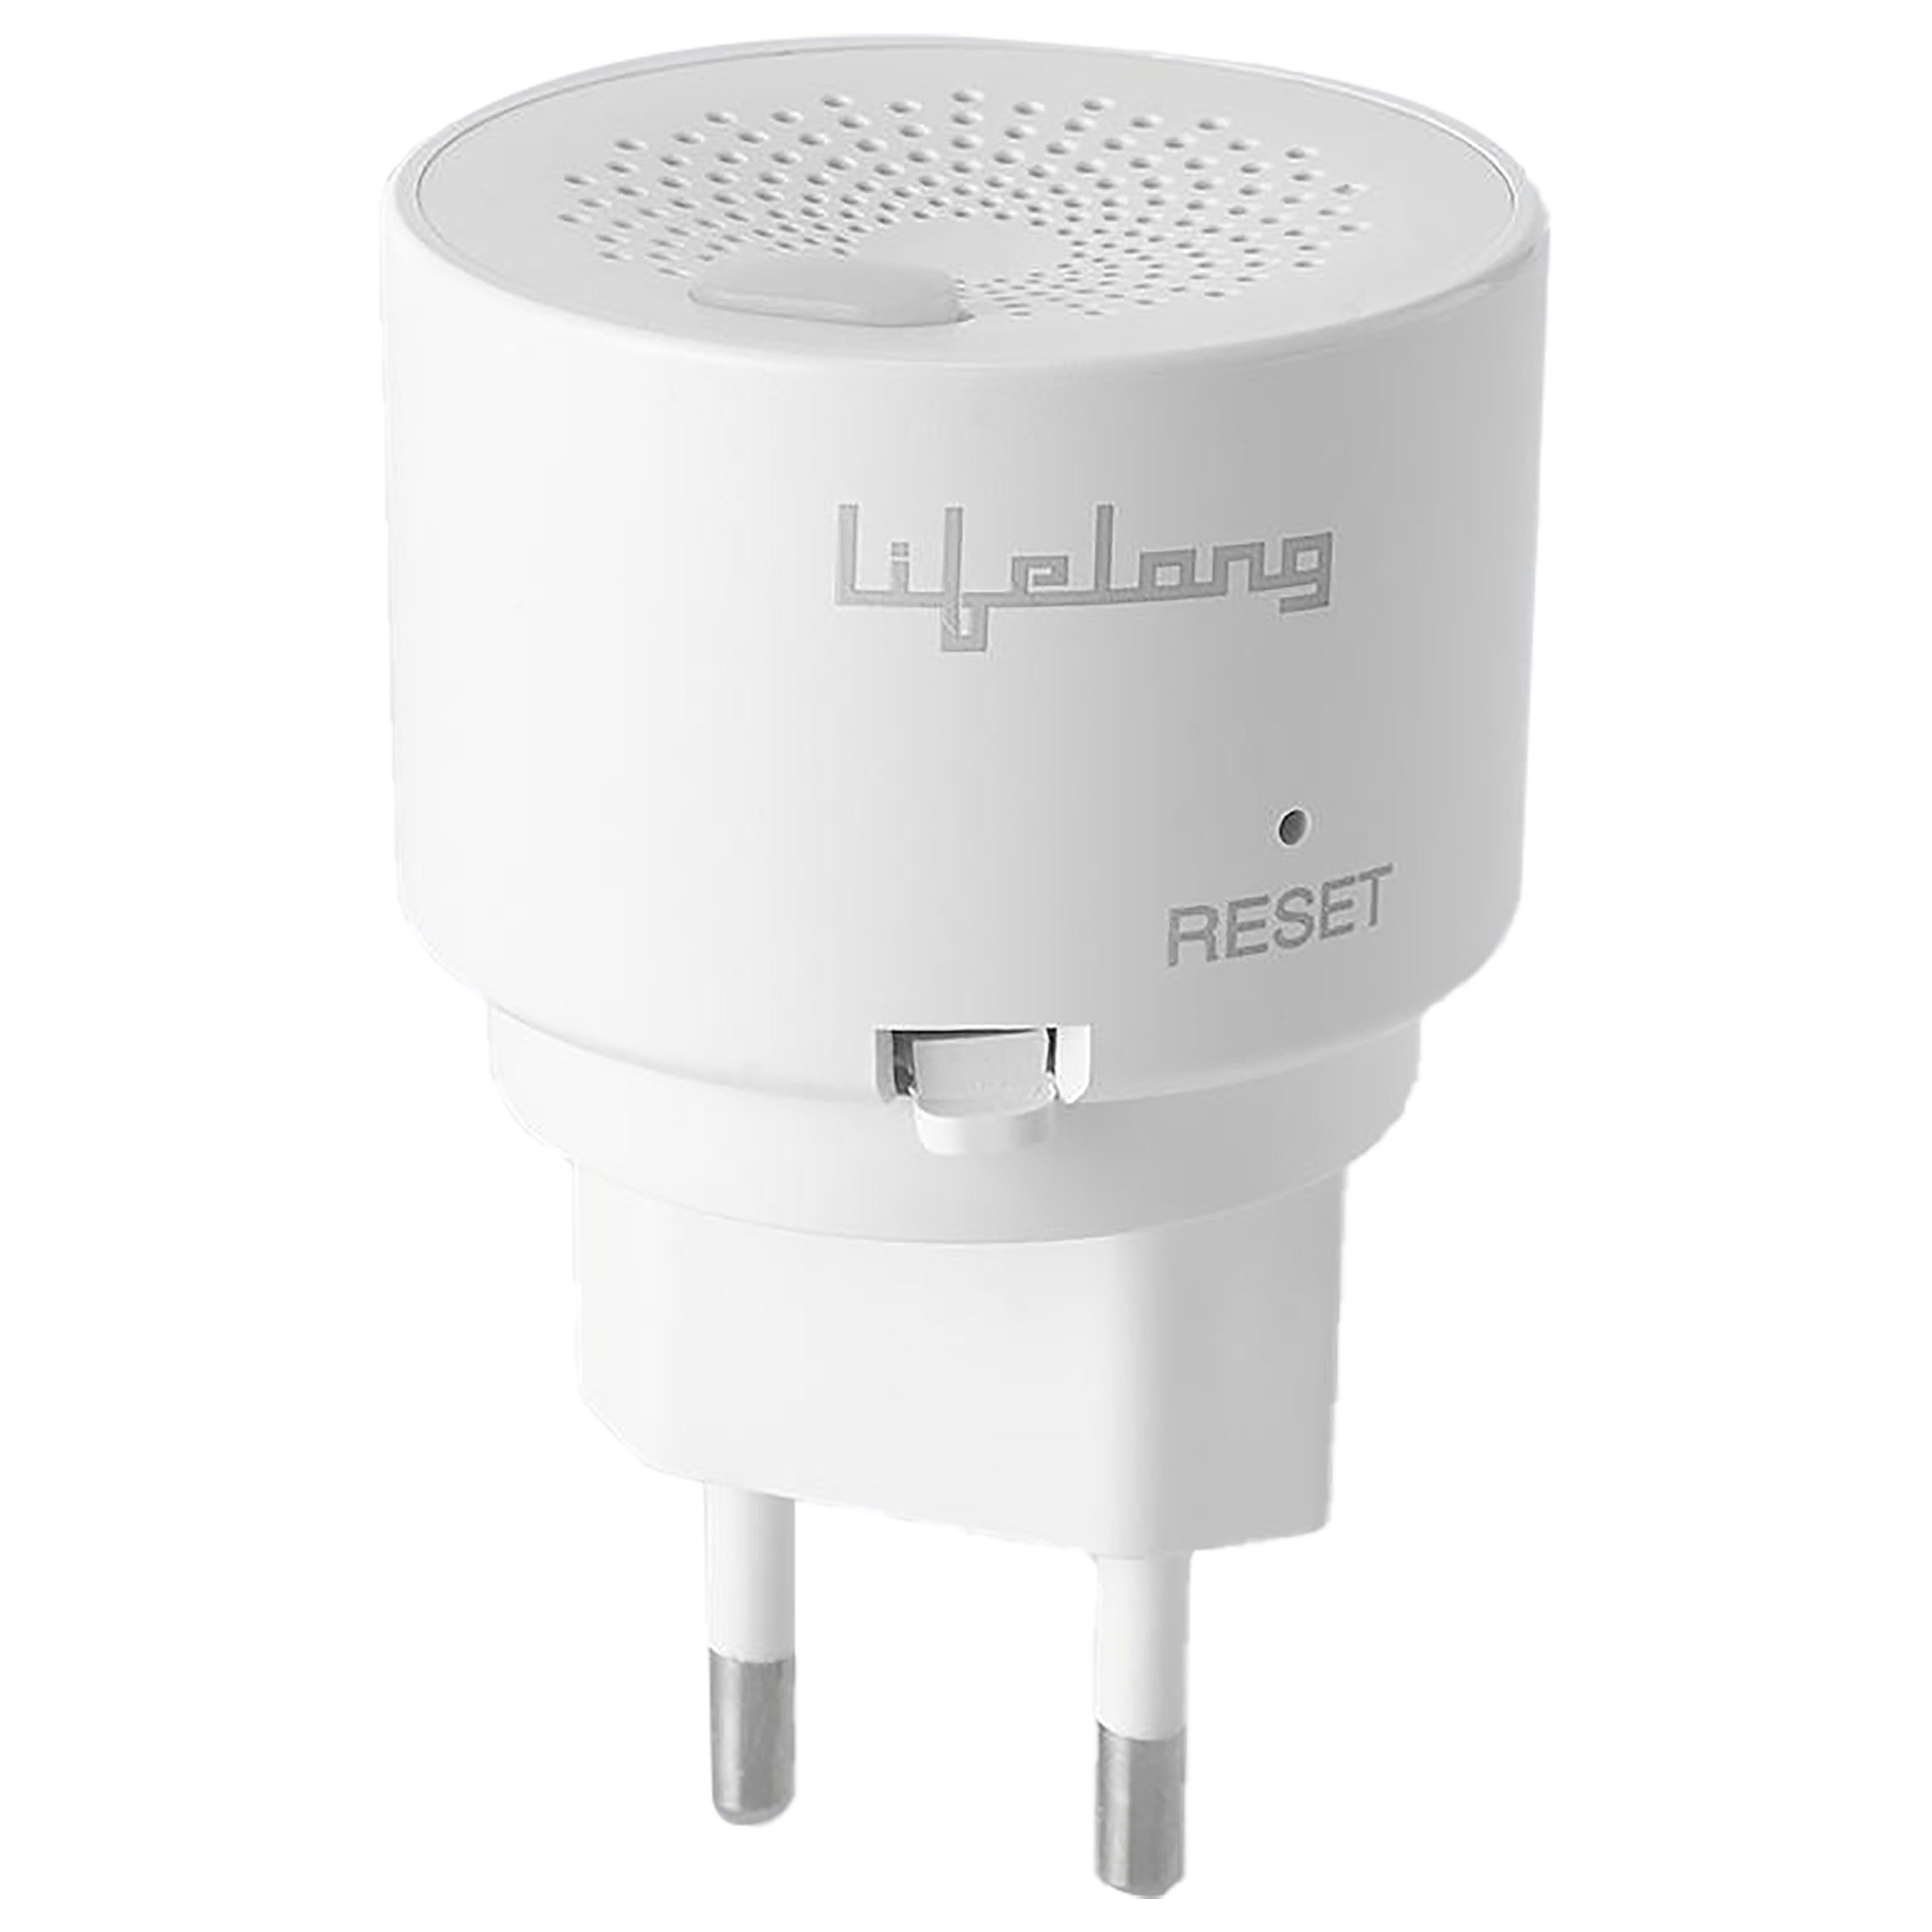 Lifelong Gas Detector (85 dB, Lifelong Smart Home App, LLDS03, White)_1